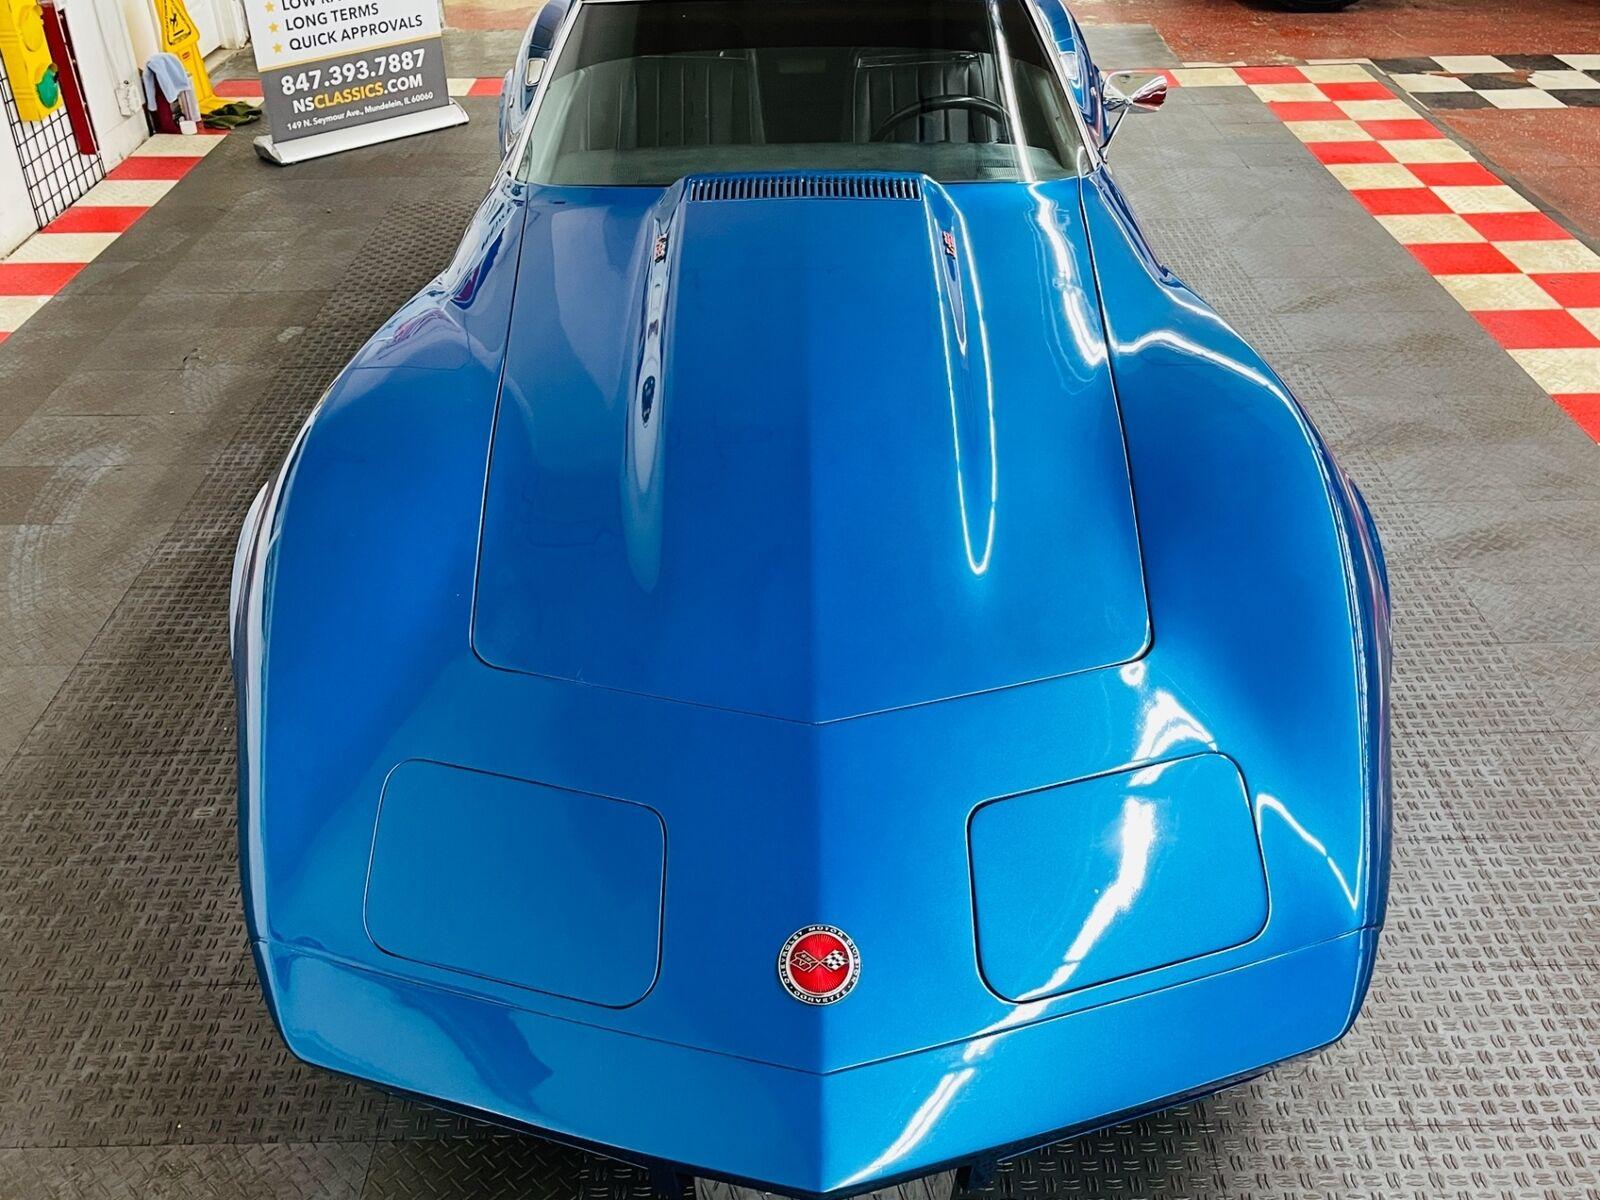 1973 Blue Chevrolet Corvette Coupe  | C3 Corvette Photo 10